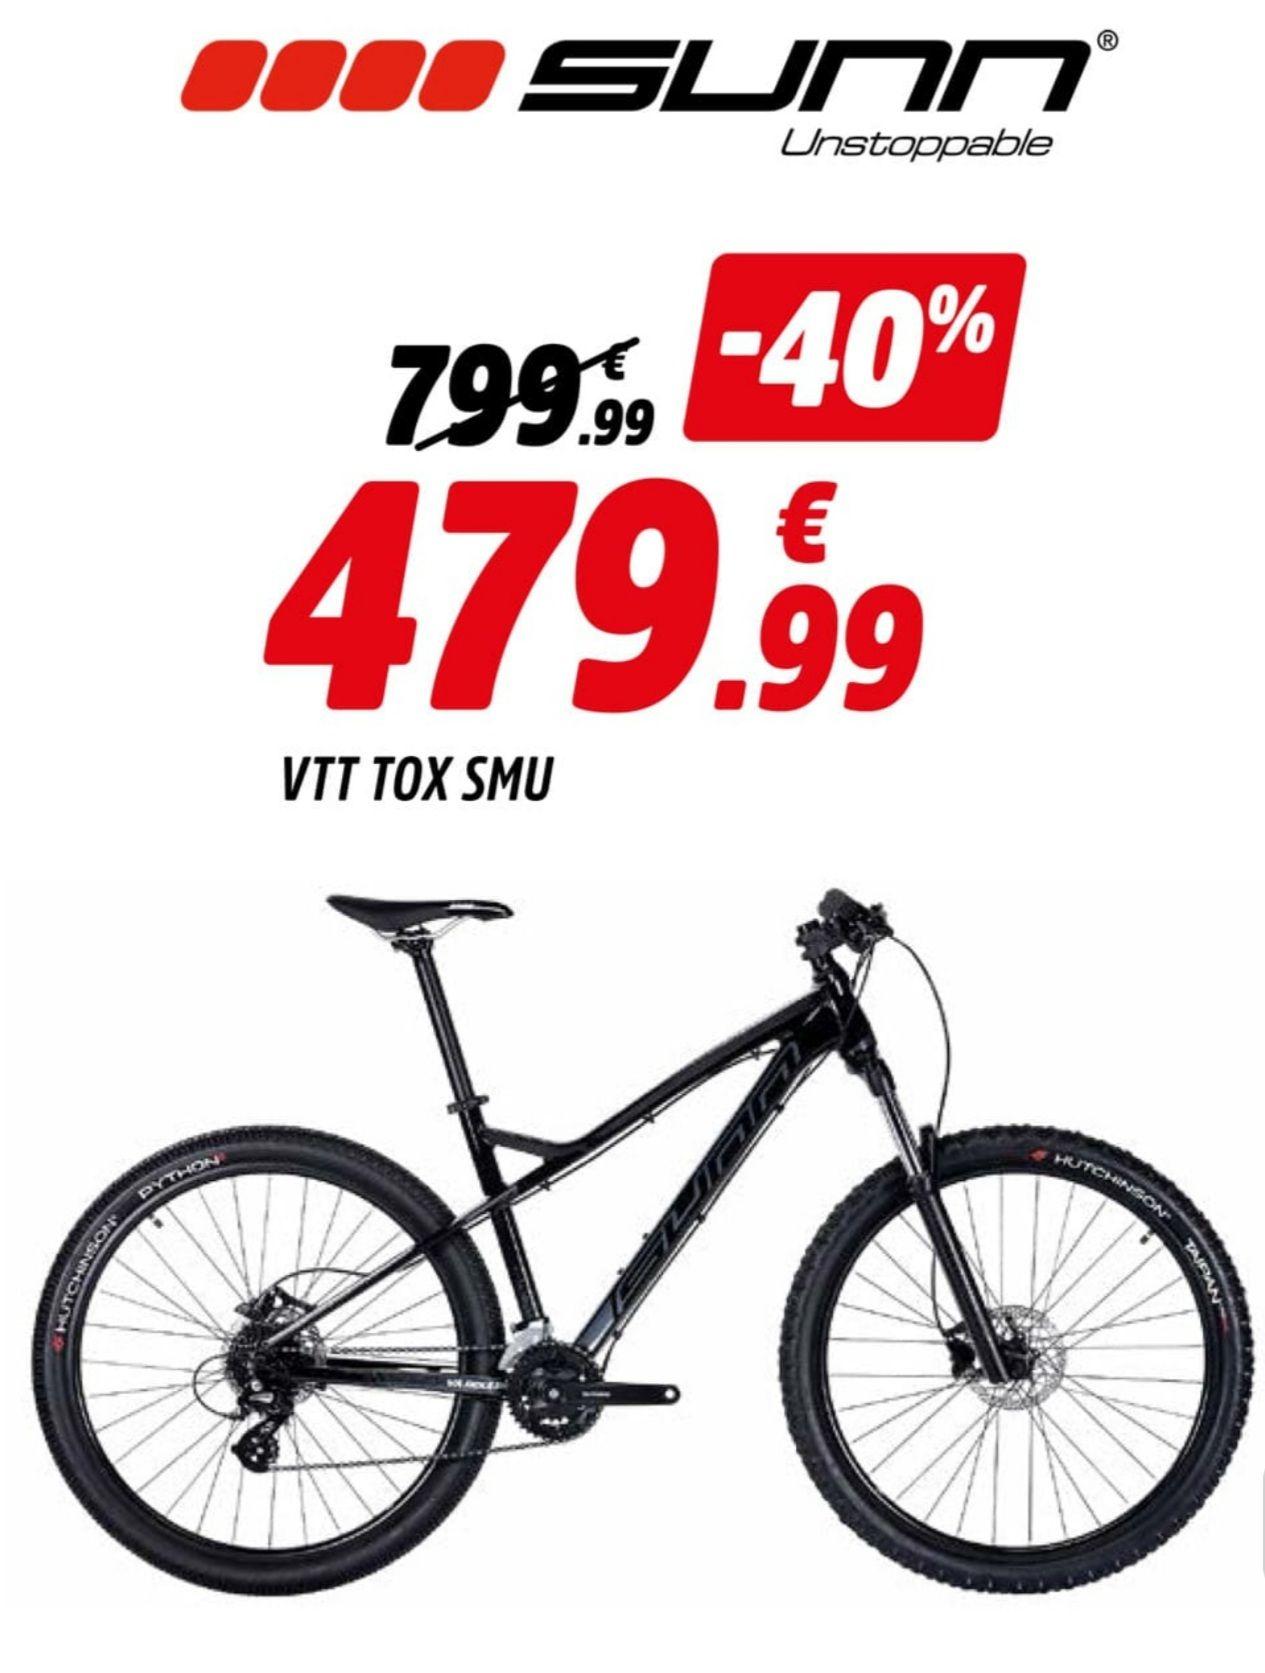 VTT TOX SMU Sunn - Lanester (56)